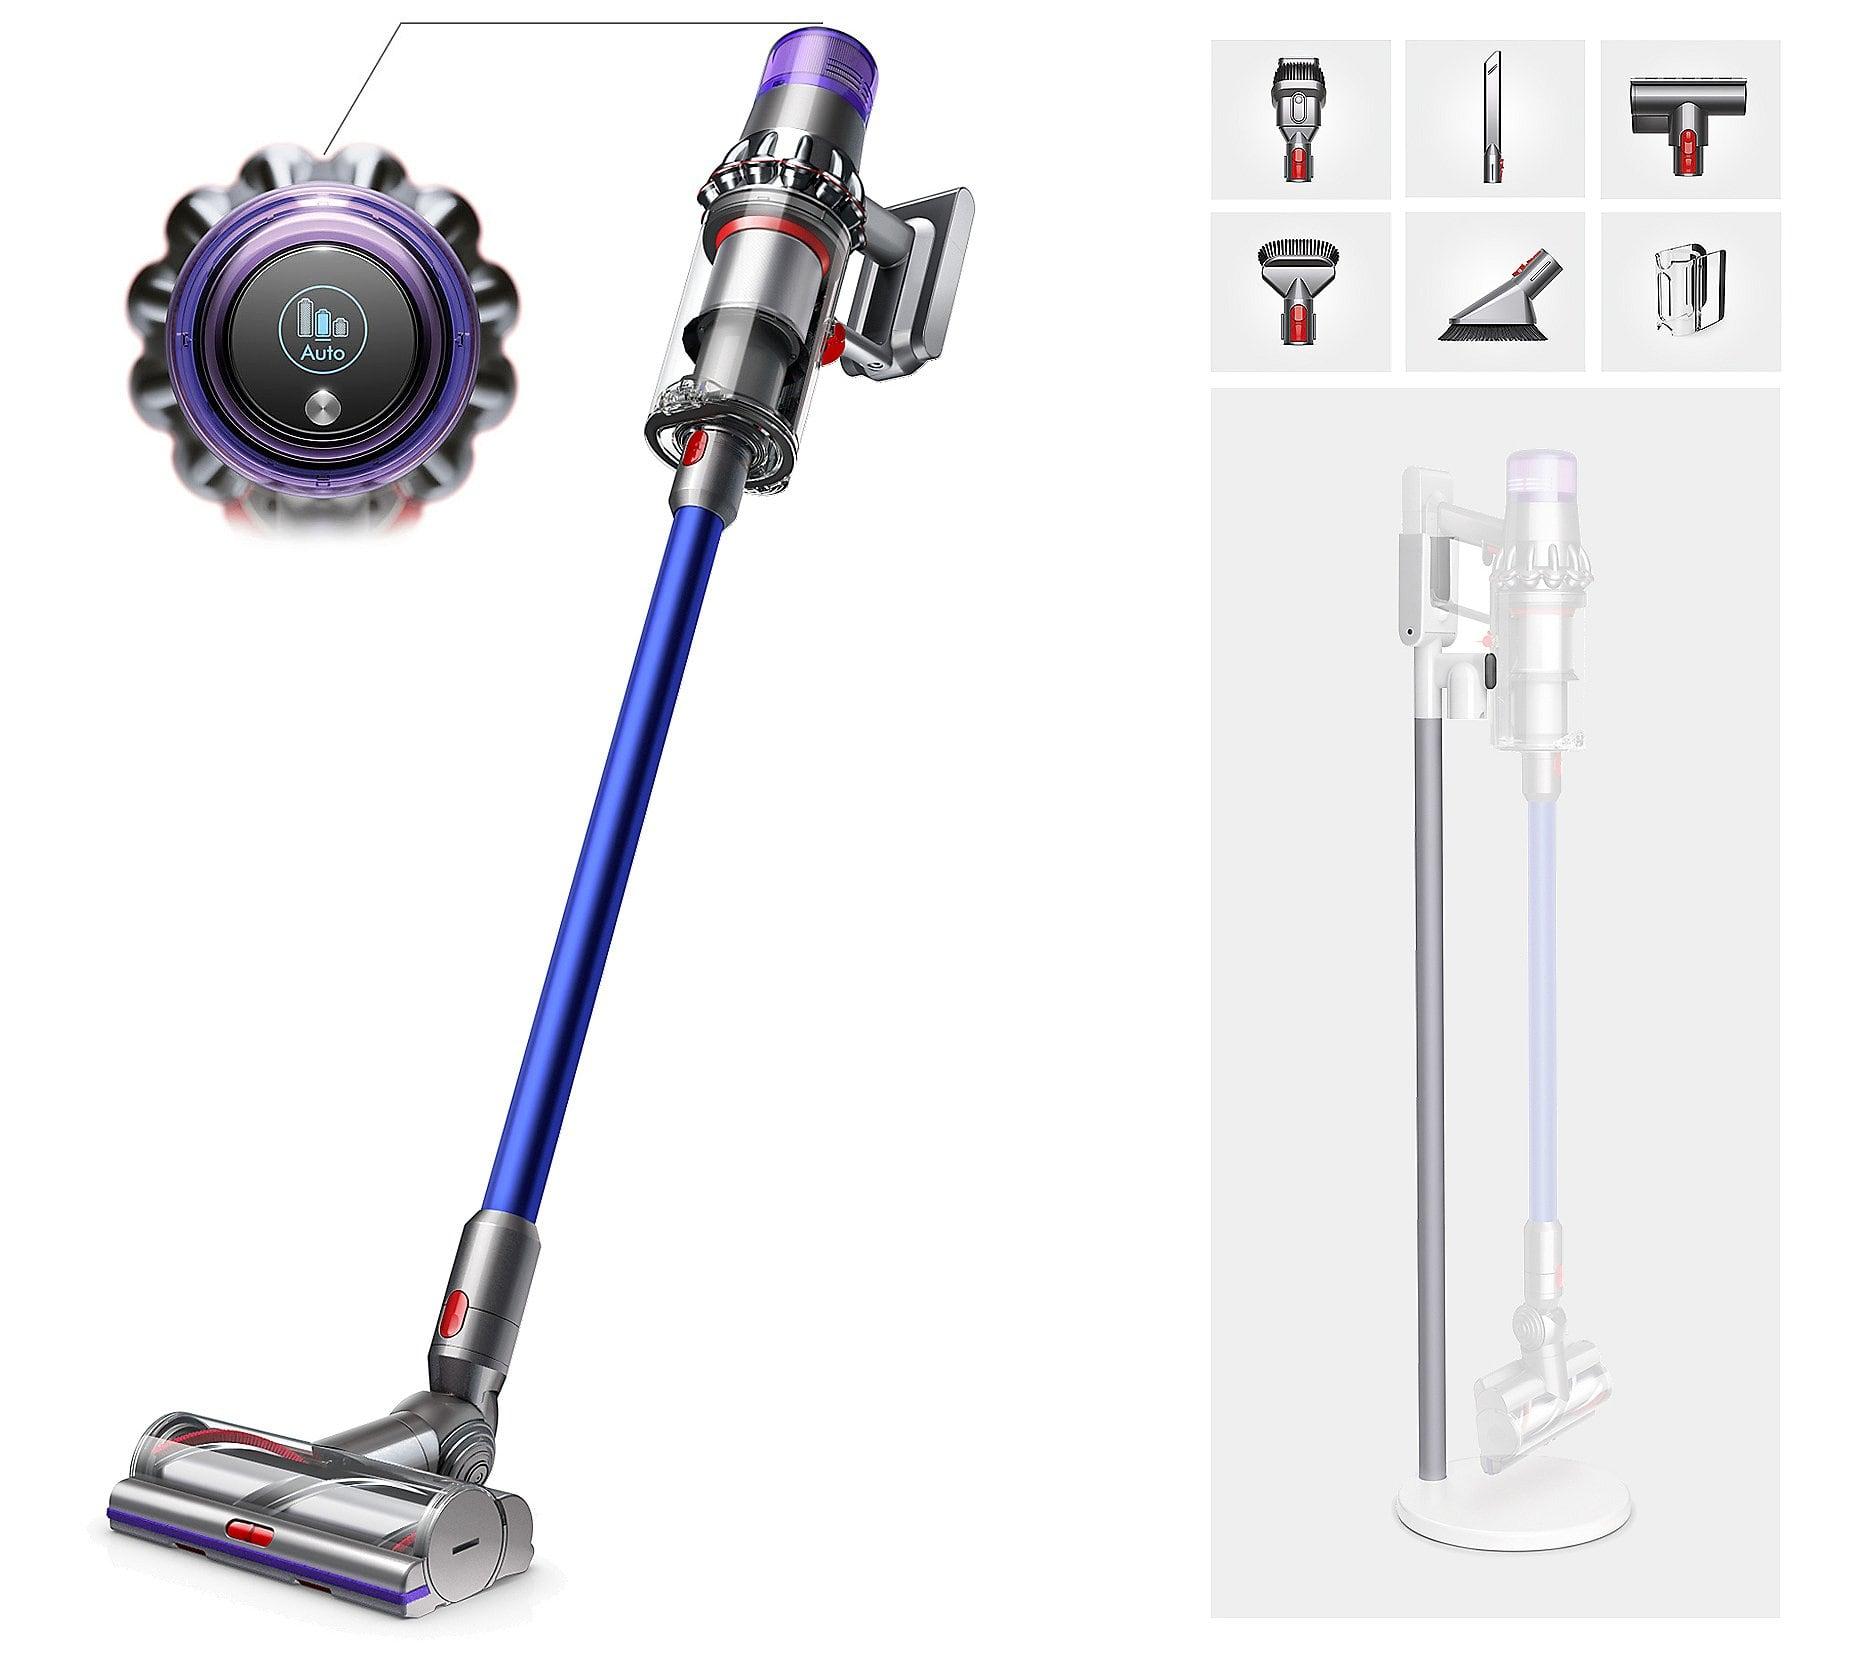 Dyson V11 Torque Drive Cordless Vacuum w/ Grab-and-Go Floor Dok